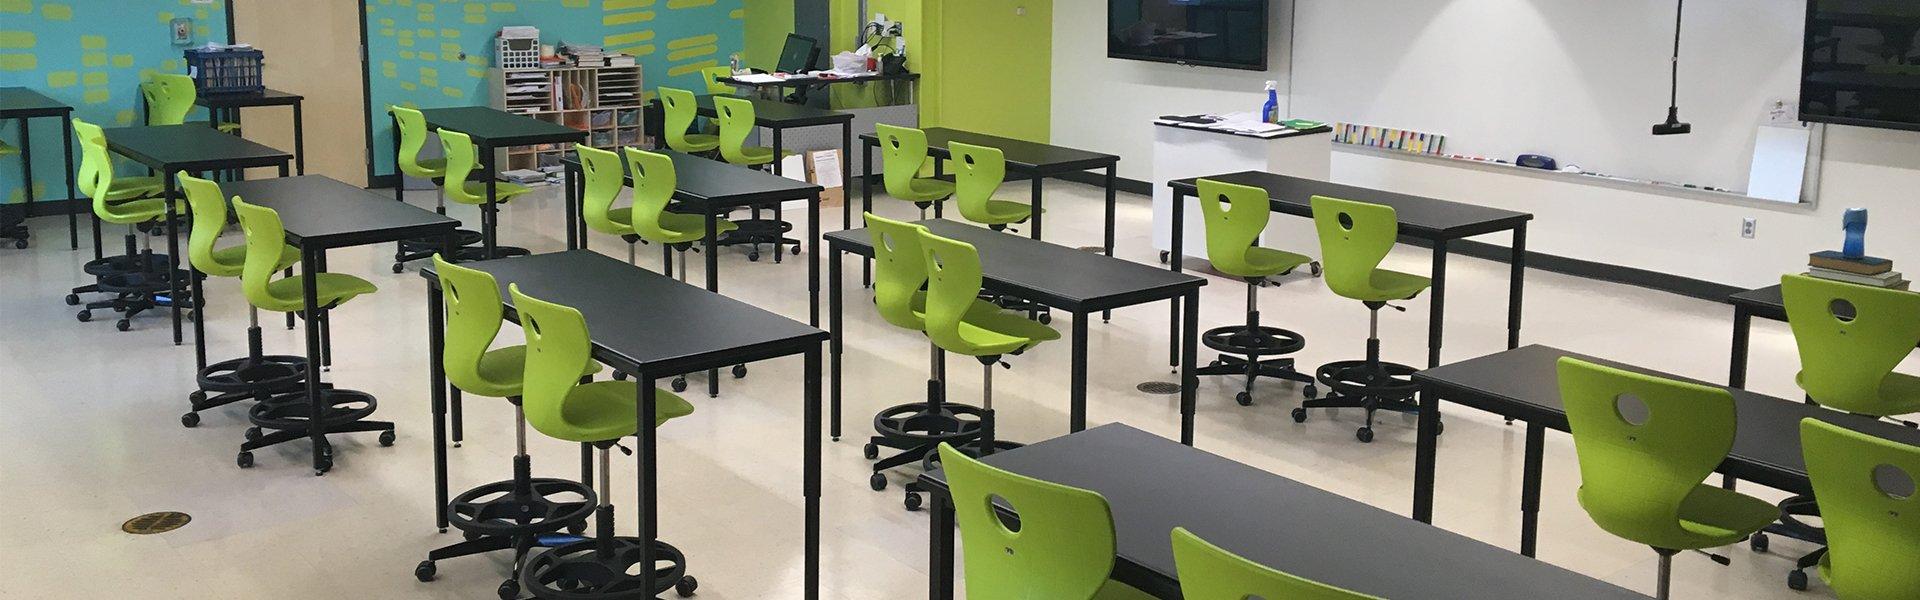 Corilam Lab Classroom Adjustable Height Desks